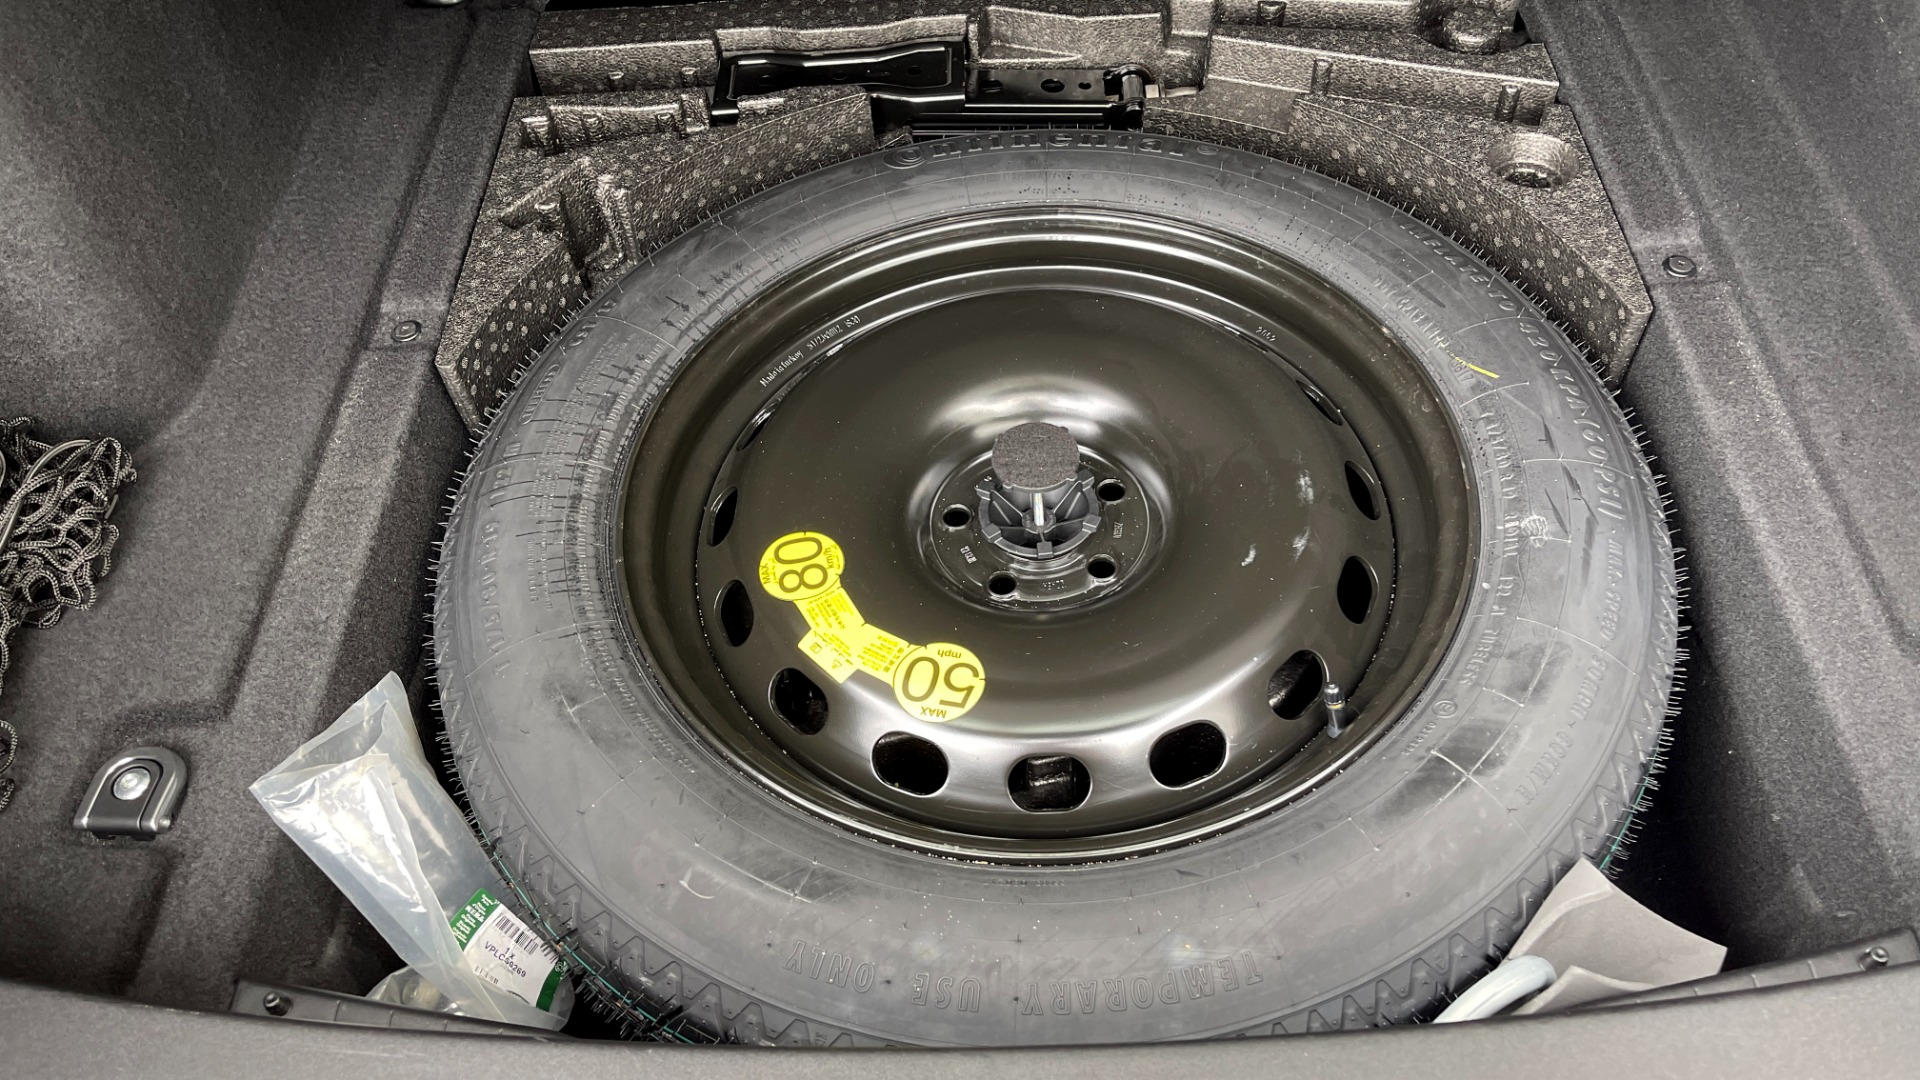 Used 2018 Land Rover RANGE ROVER VELAR R-DYNAMIC SE / NAV / PREM / MERIDIAN / SUNROOF / REARVIEW for sale $54,995 at Formula Imports in Charlotte NC 28227 22